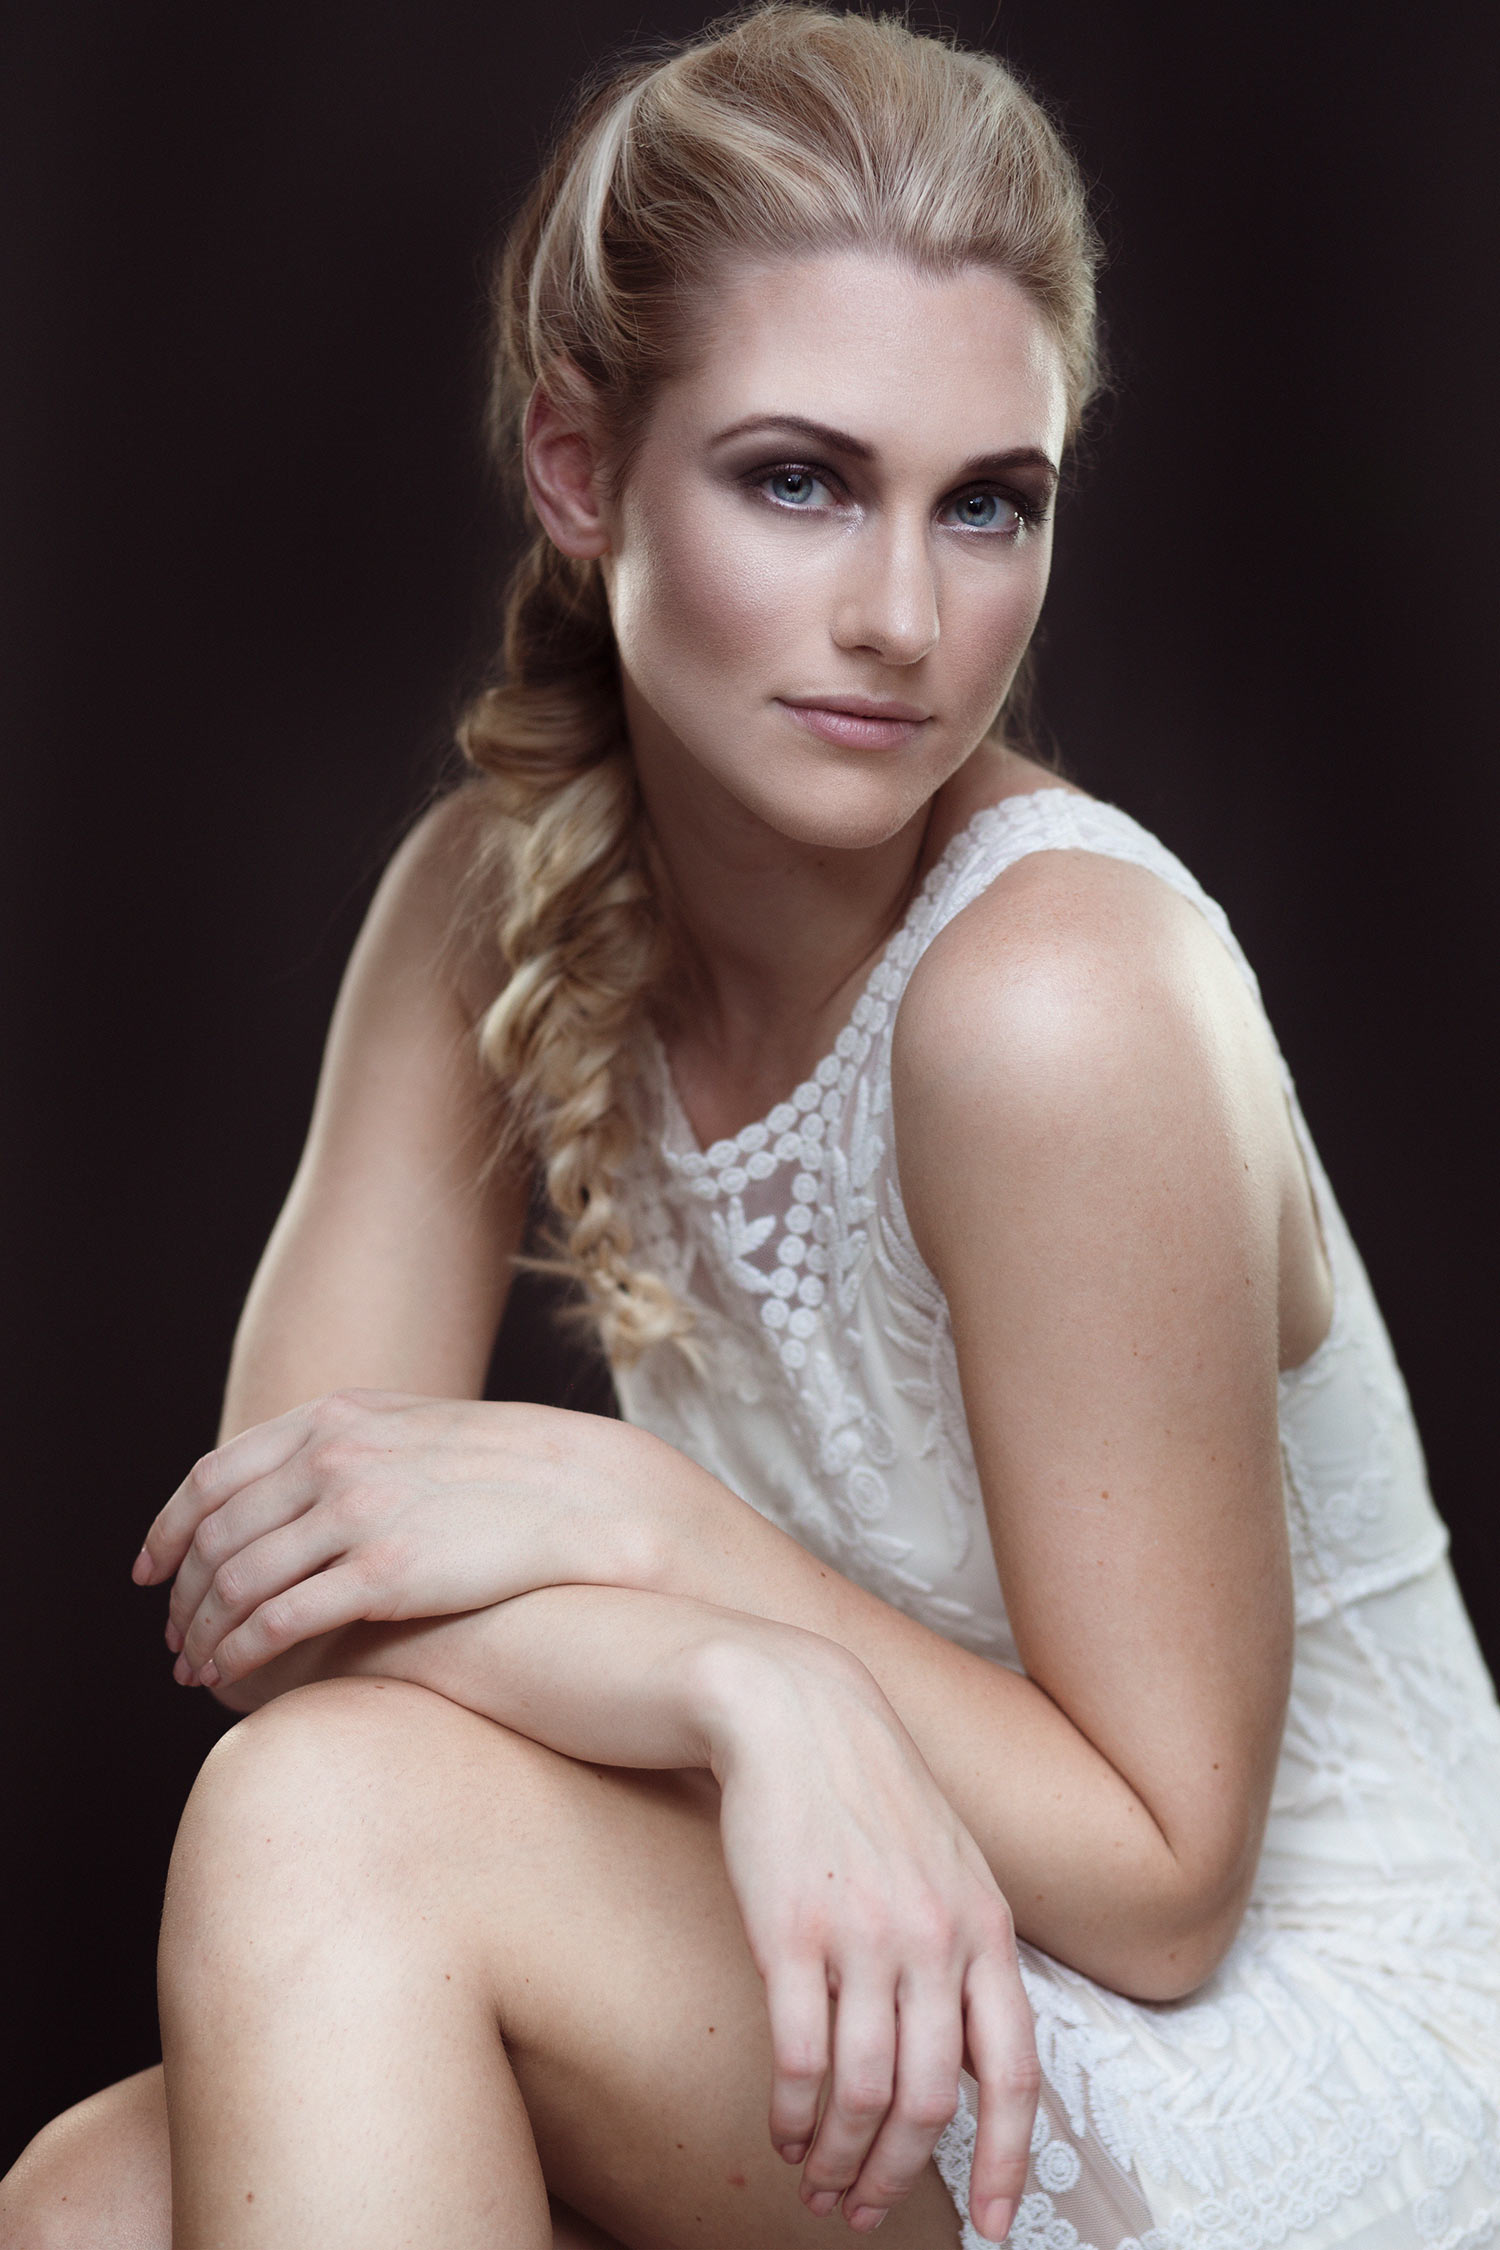 beauty-portrait-woman-photography